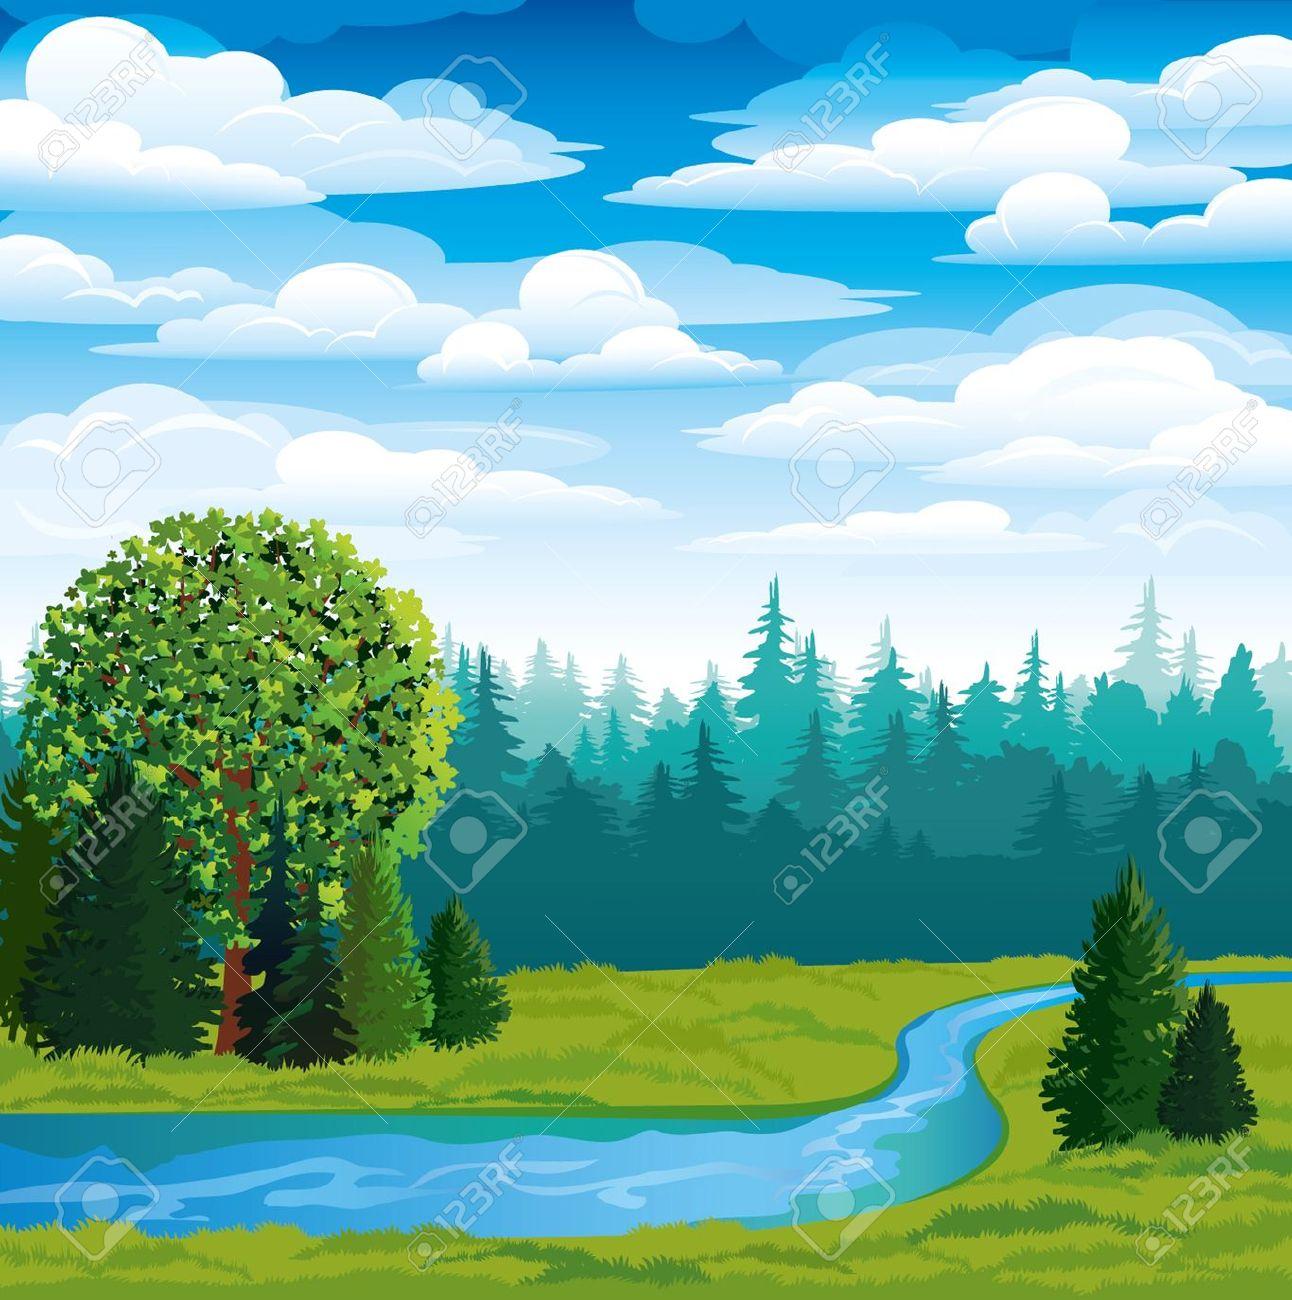 River Clip Art Free.